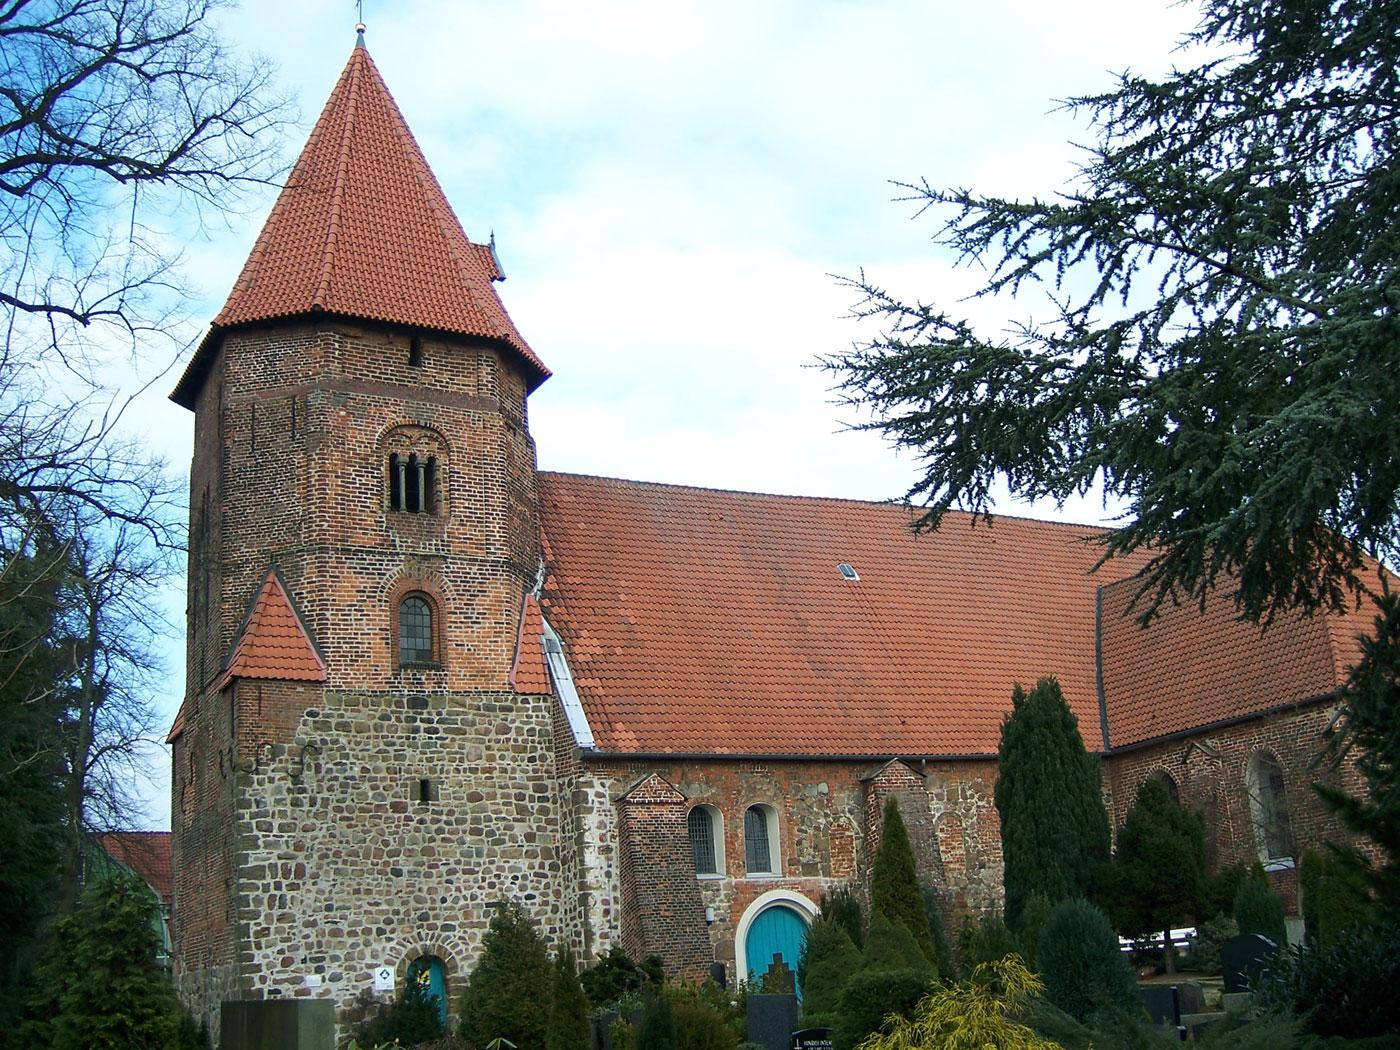 Achim Germany  city photos gallery : Kirche Achim Weser Wikipedia, the free encyclopedia